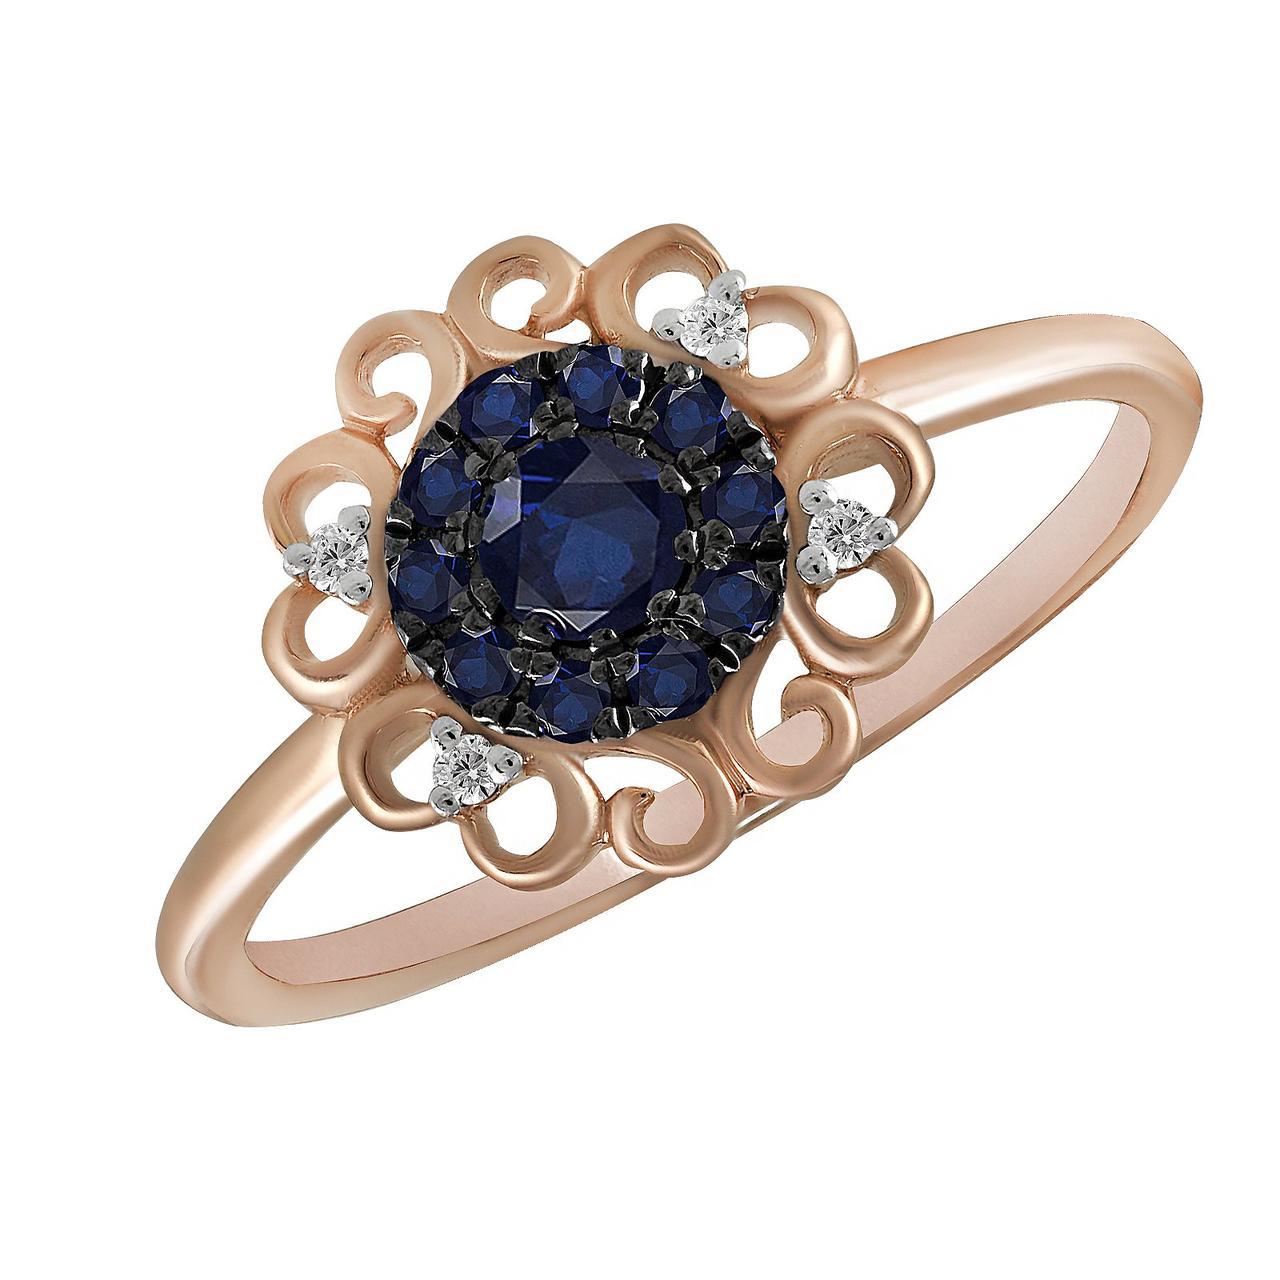 Золотое кольцо с бриллиантами и сапфирами, размер 16 (877002)